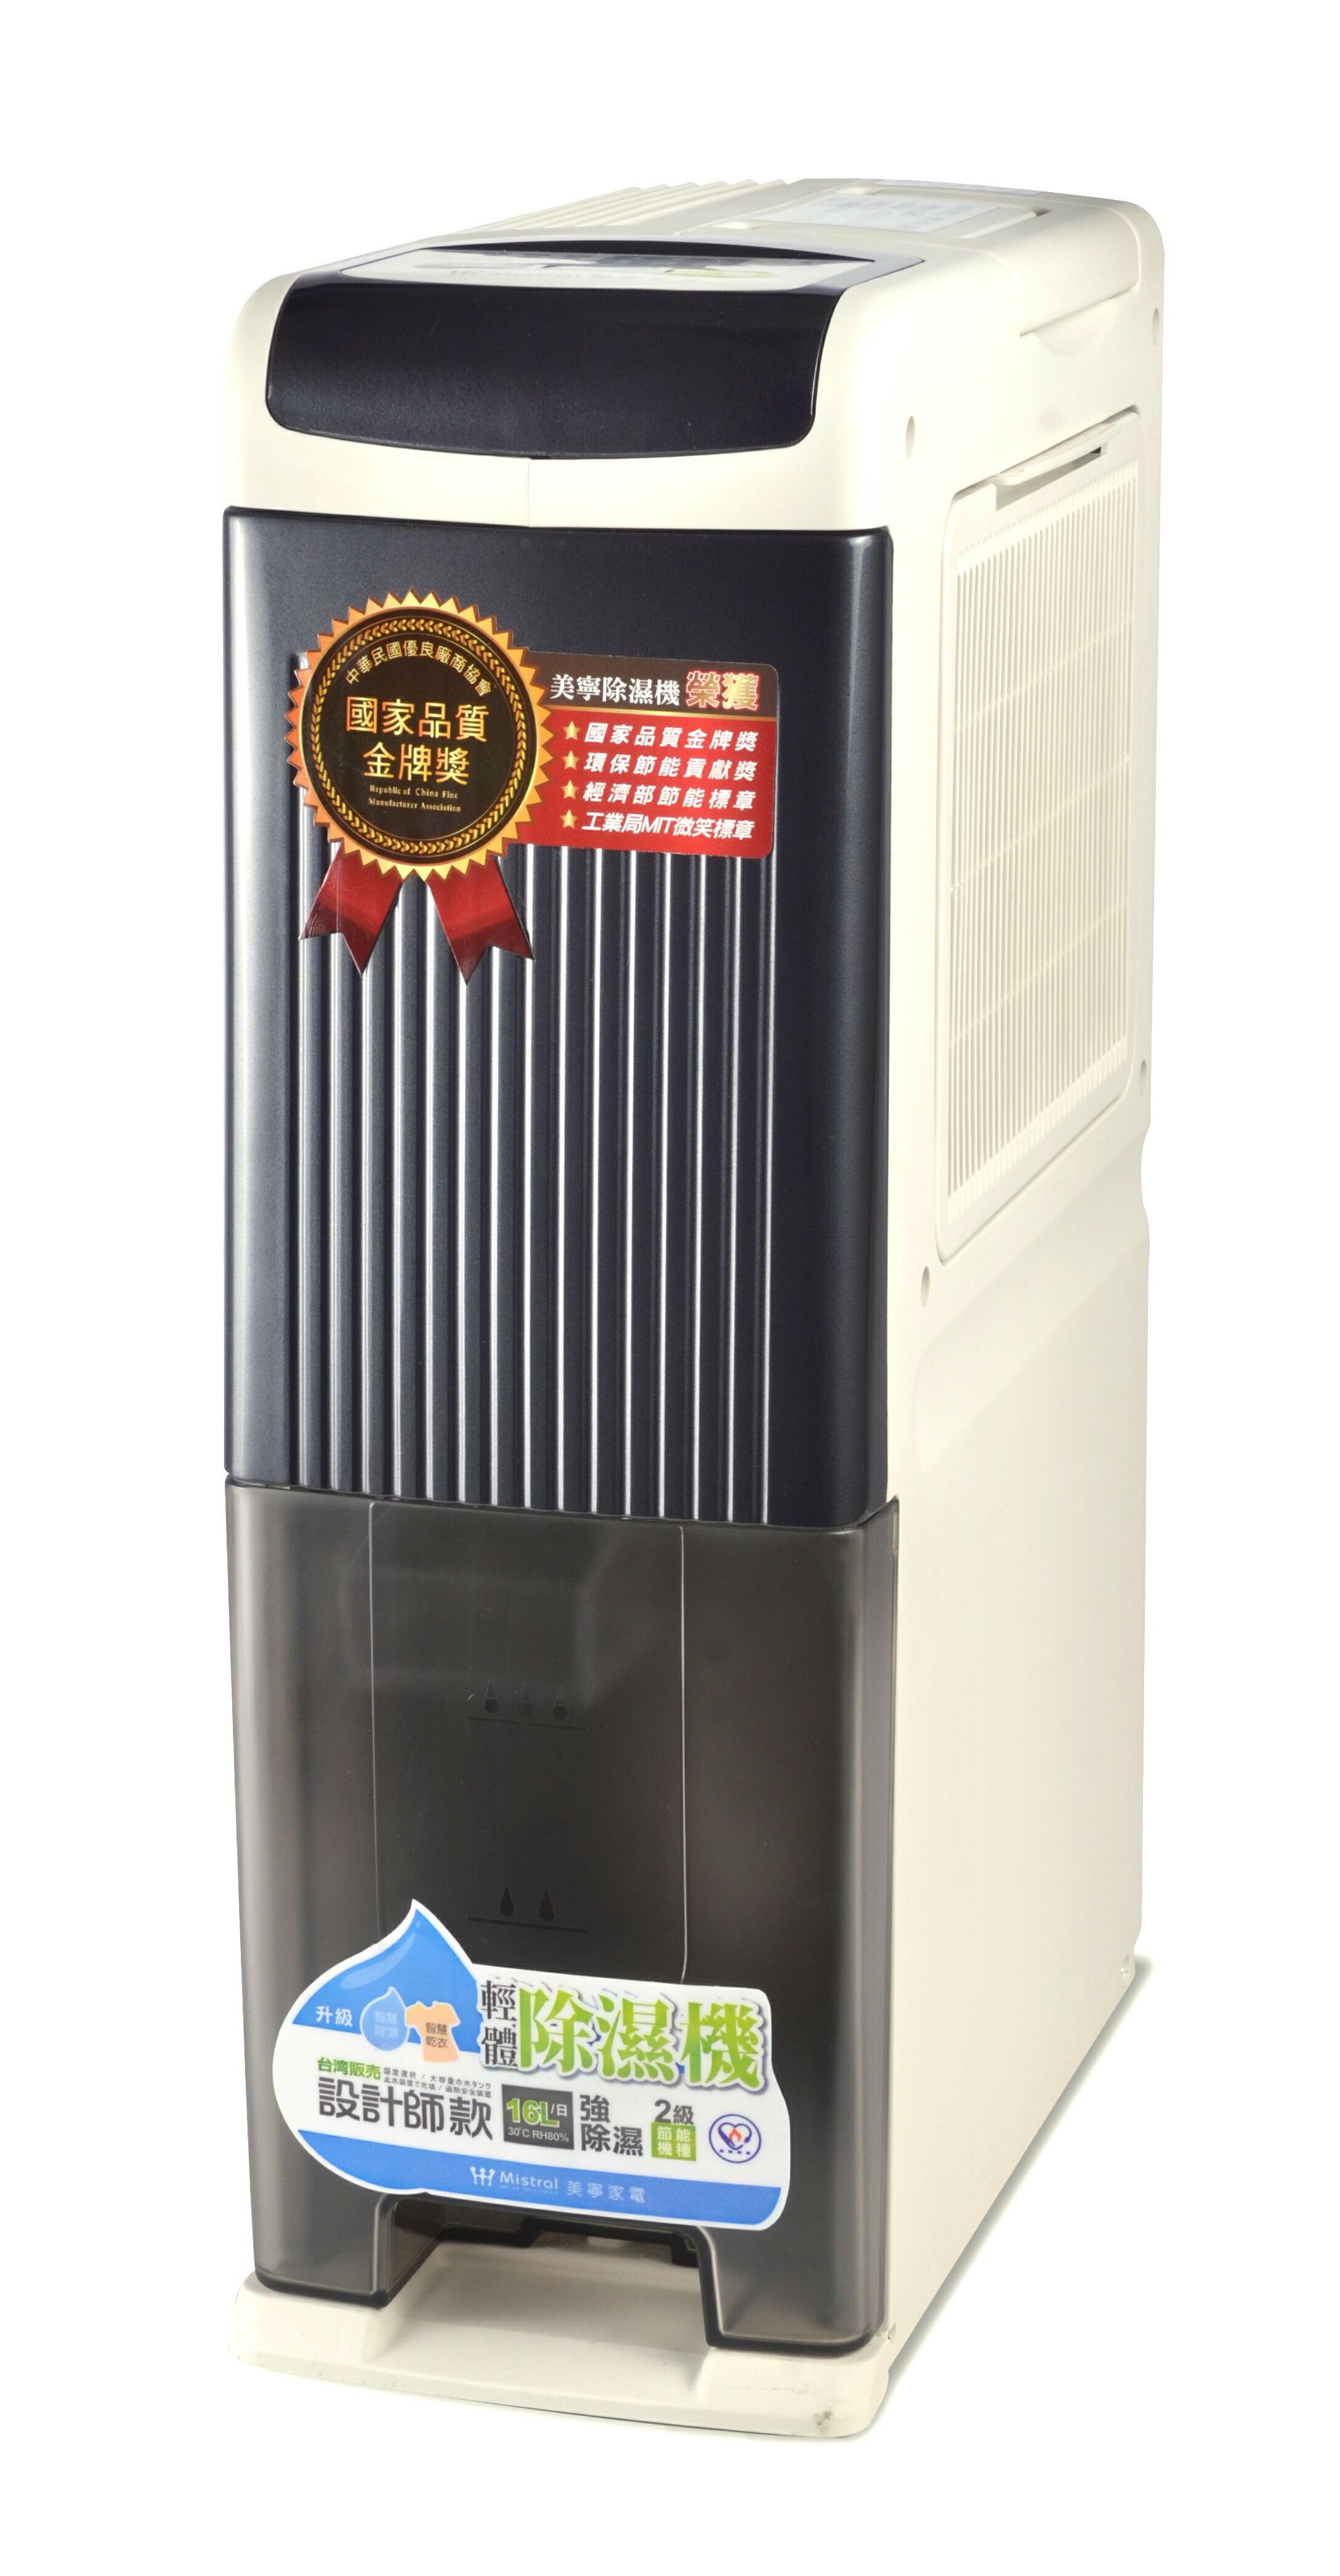 【Mistral 美寧】16L環保節能定時輕體除濕機(JR-S68B) - 限時優惠好康折扣